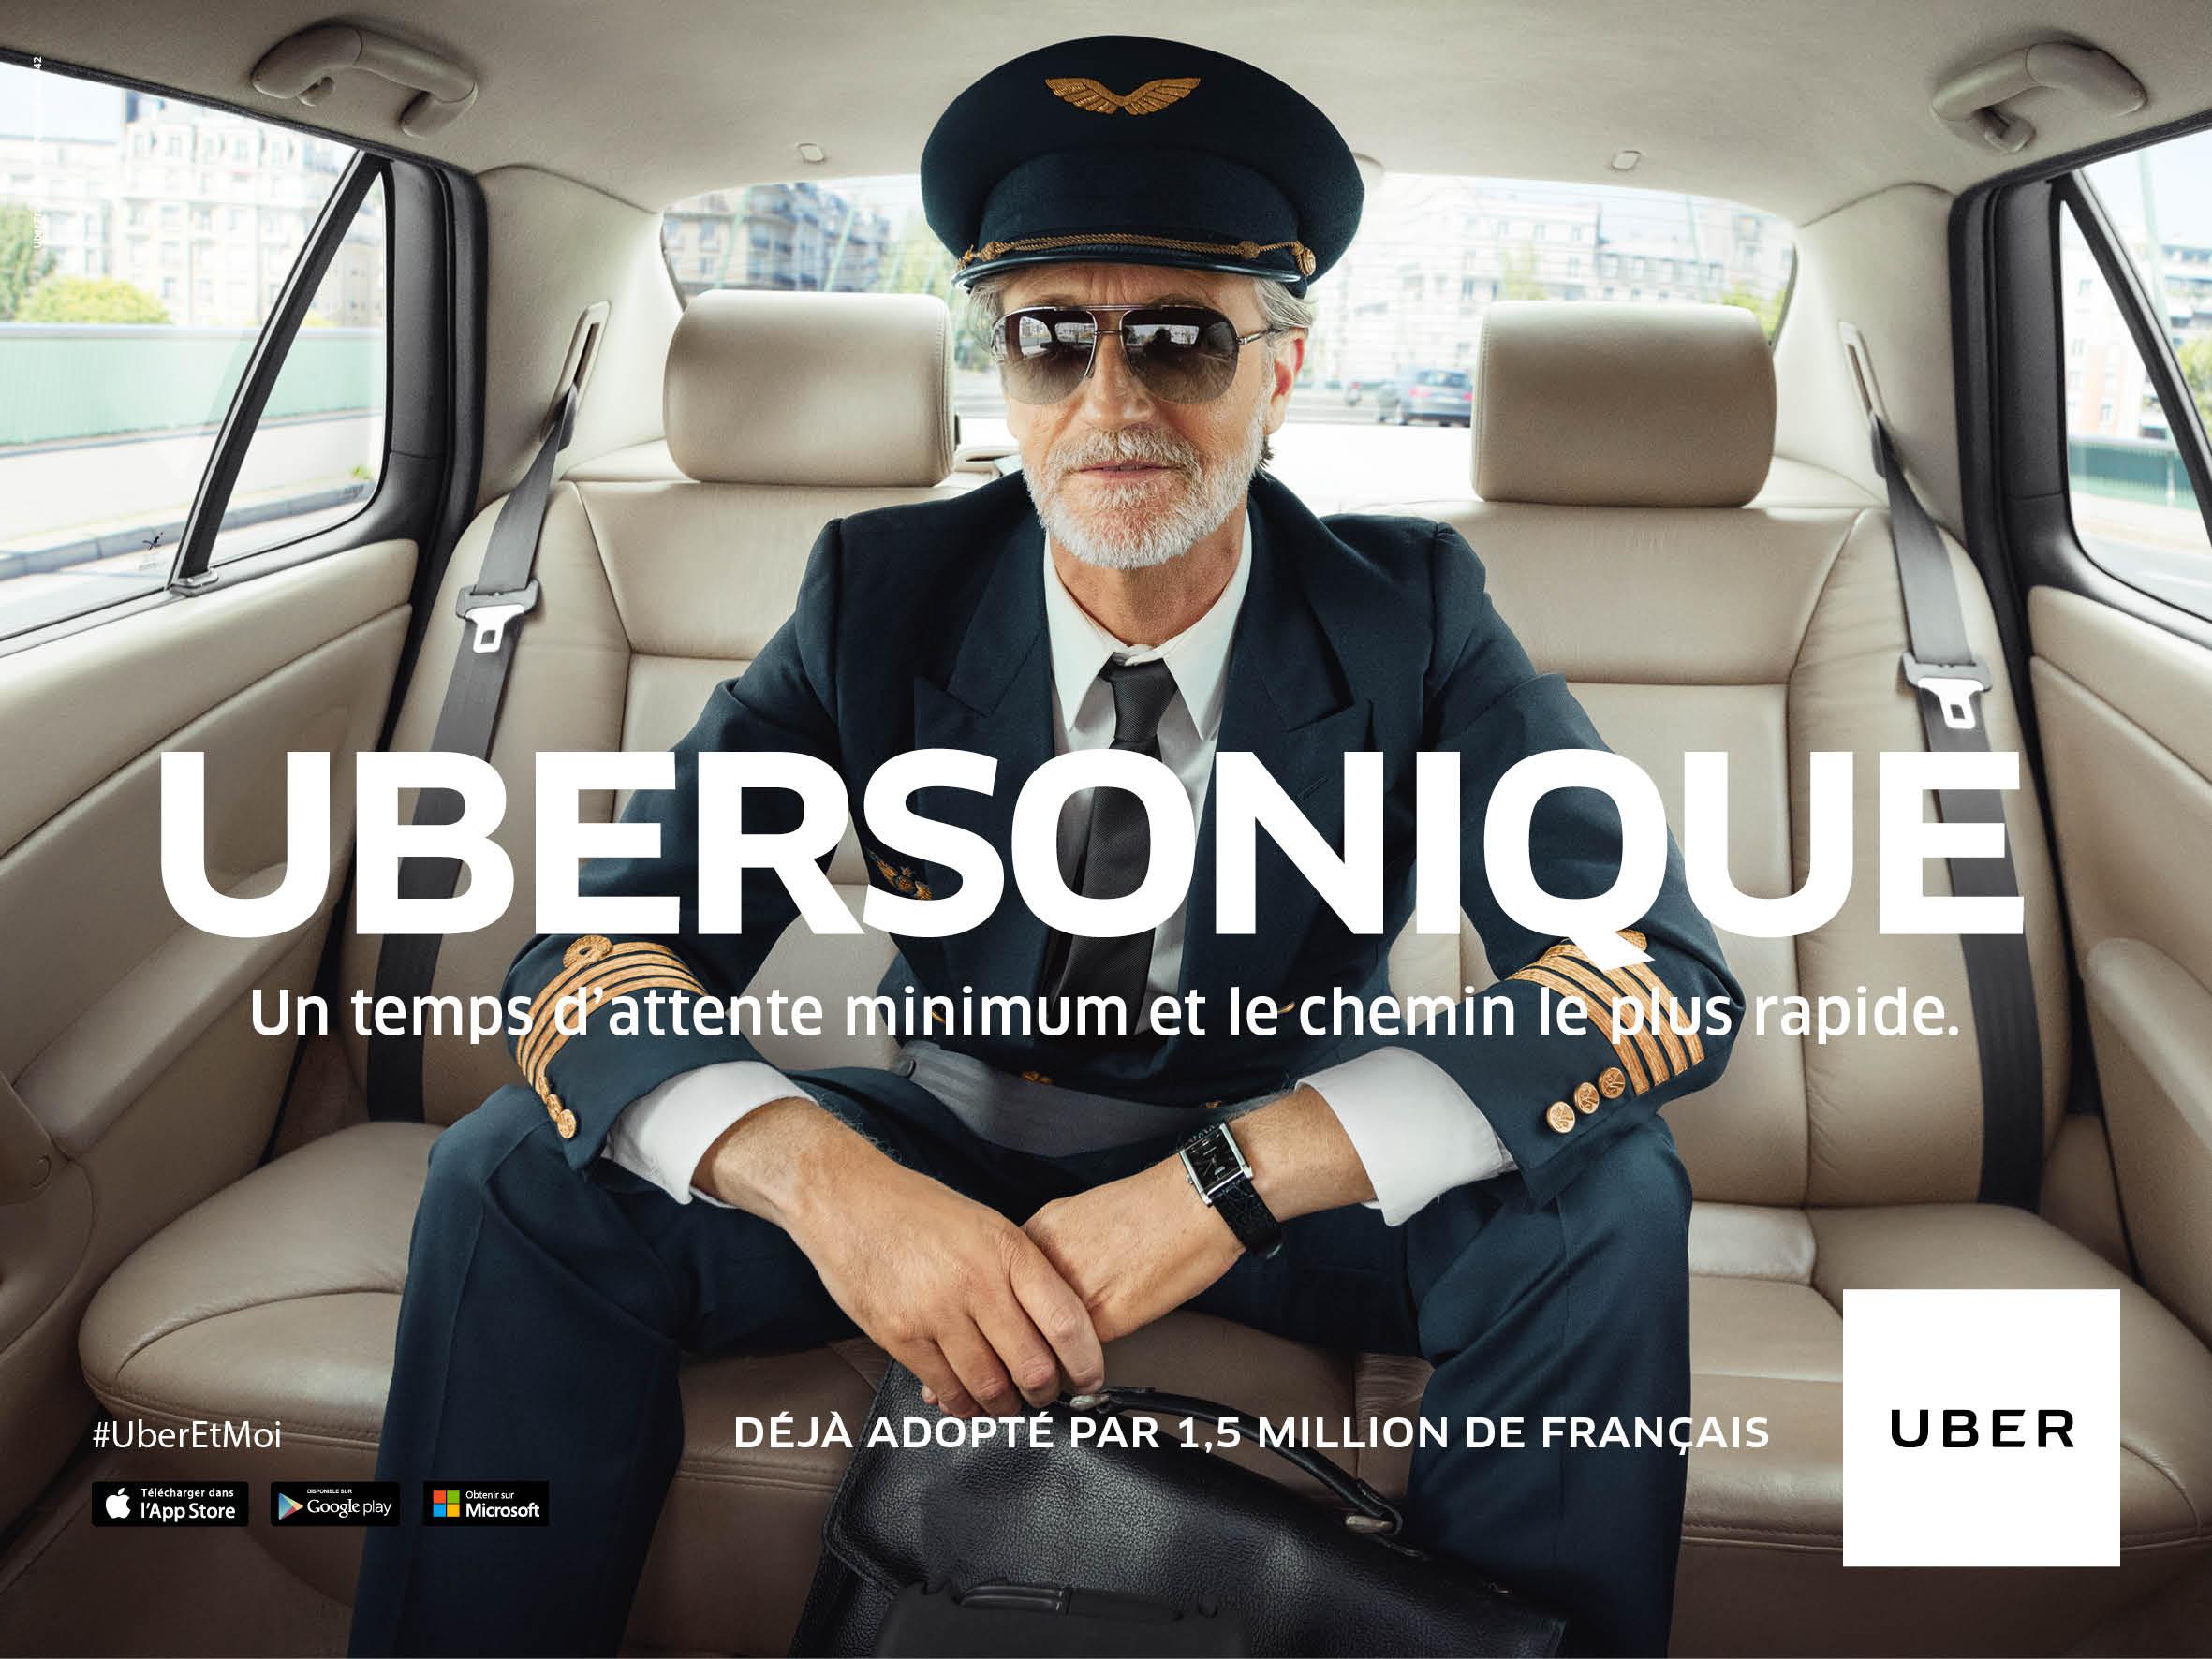 uber-france-publicite-marketing-application-utilisateurs-passagers-mars-2016-agence-marcel-publicis-6